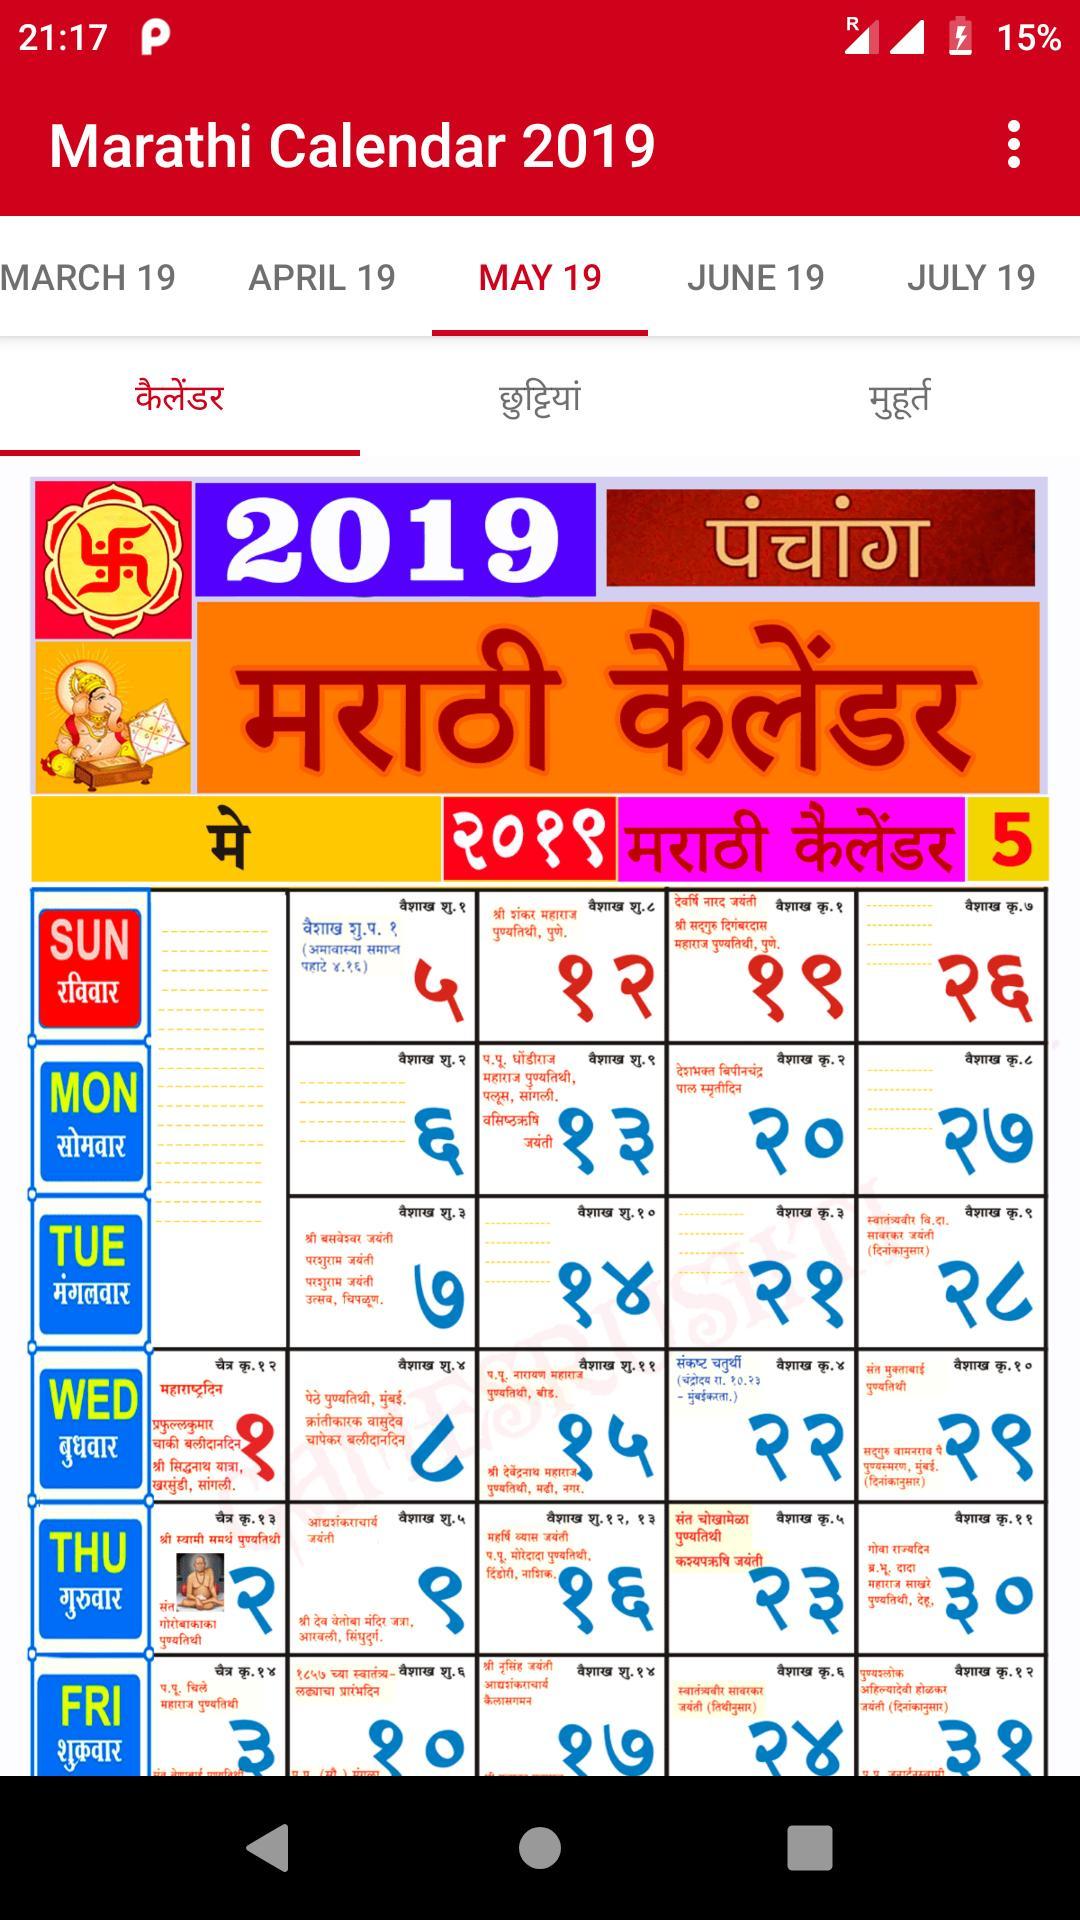 Marathi Calendar 2019 With Festival Для Андроид - Скачать Apk